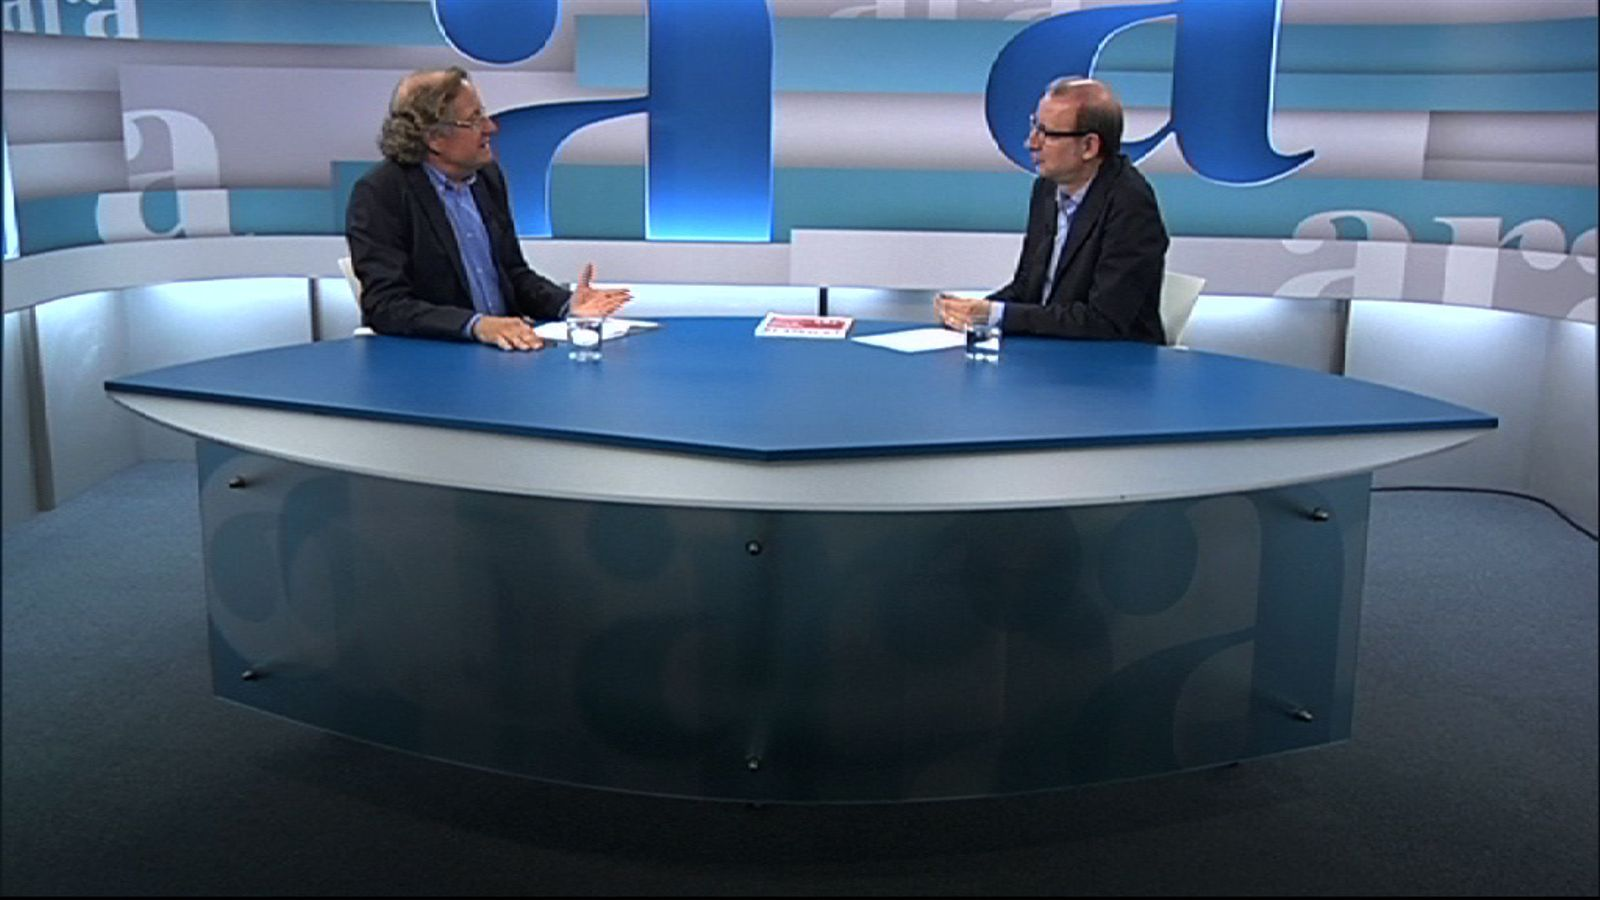 Josep Ramoneda: Sense curiositat potser encara seríem a l'edat de pedra